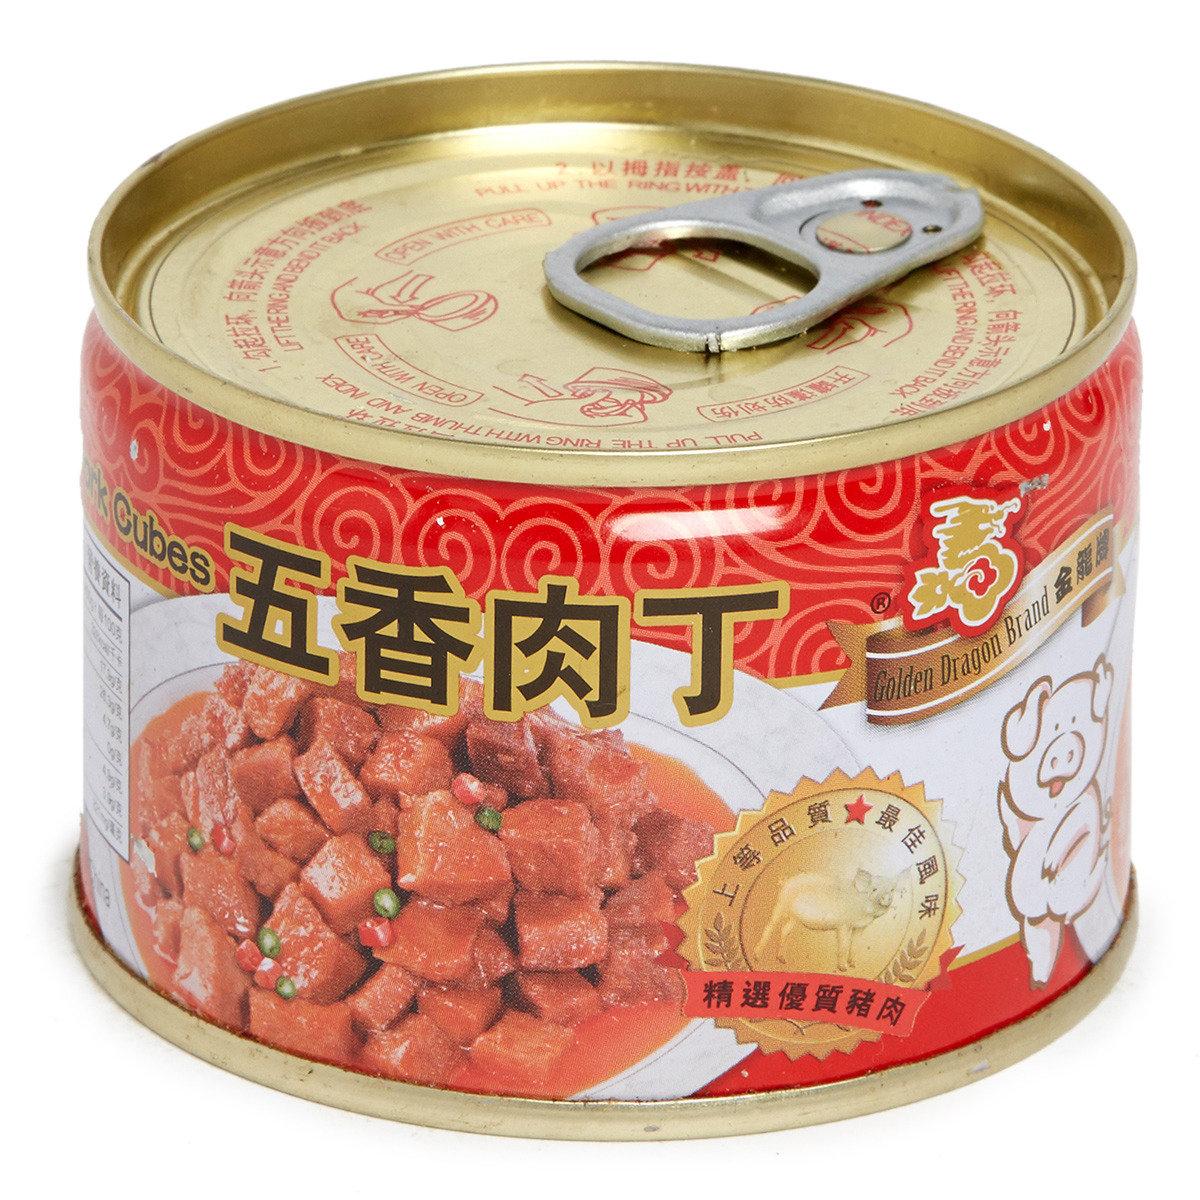 Canned-pork